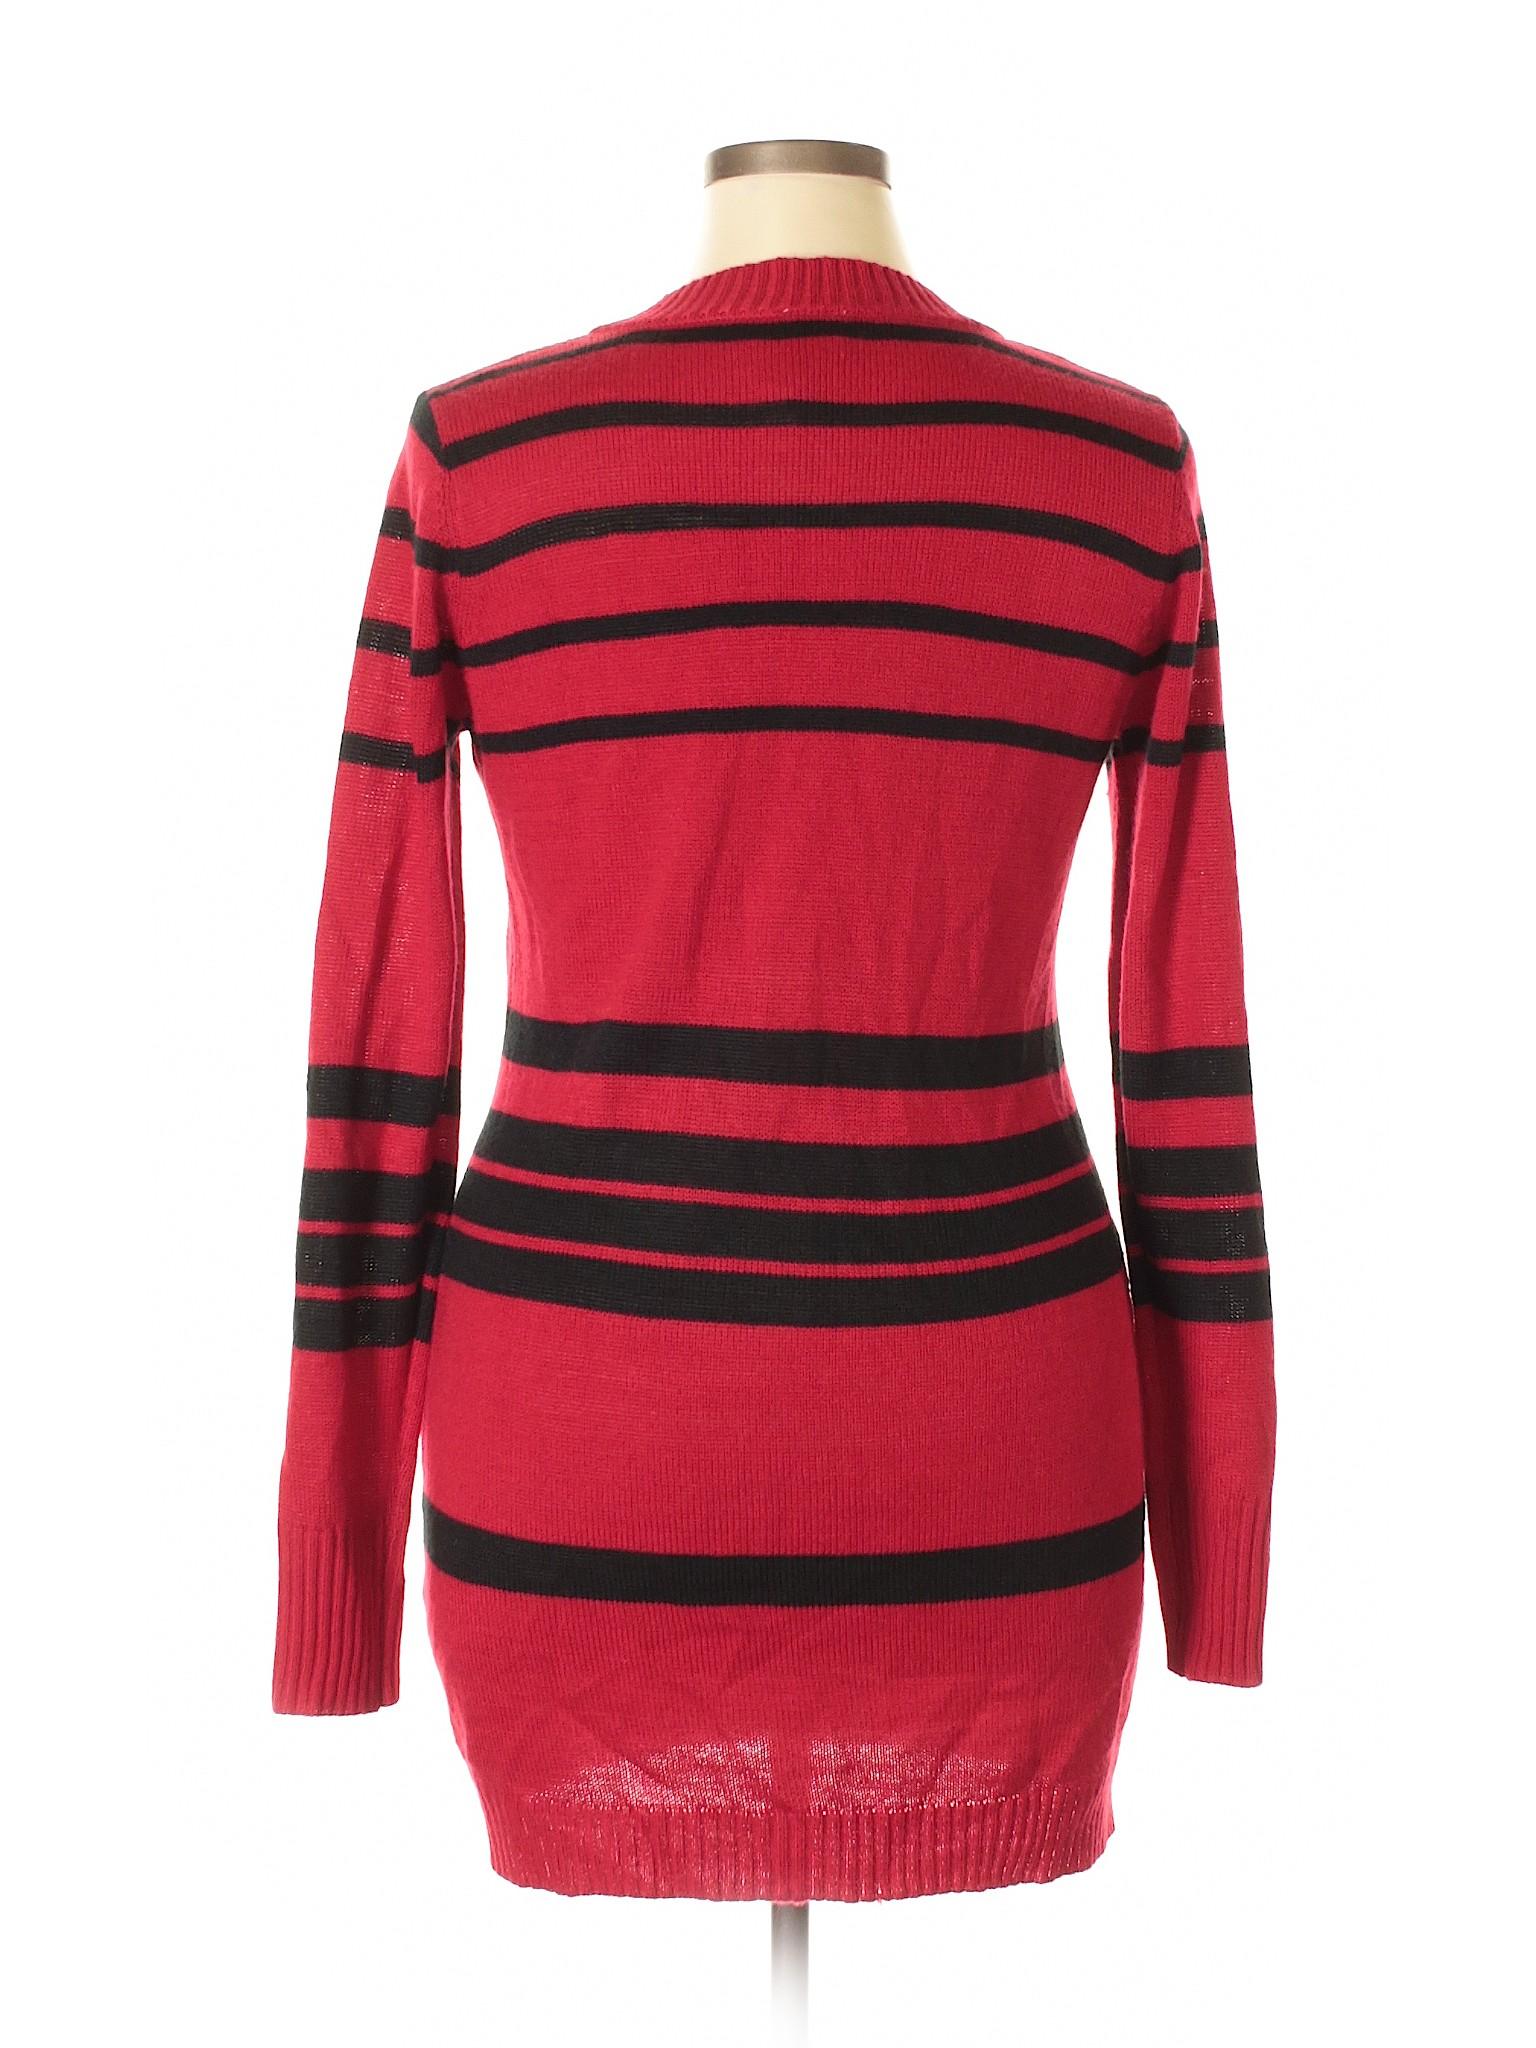 Casual Faded Glory Dress Boutique winter qB7txwxH